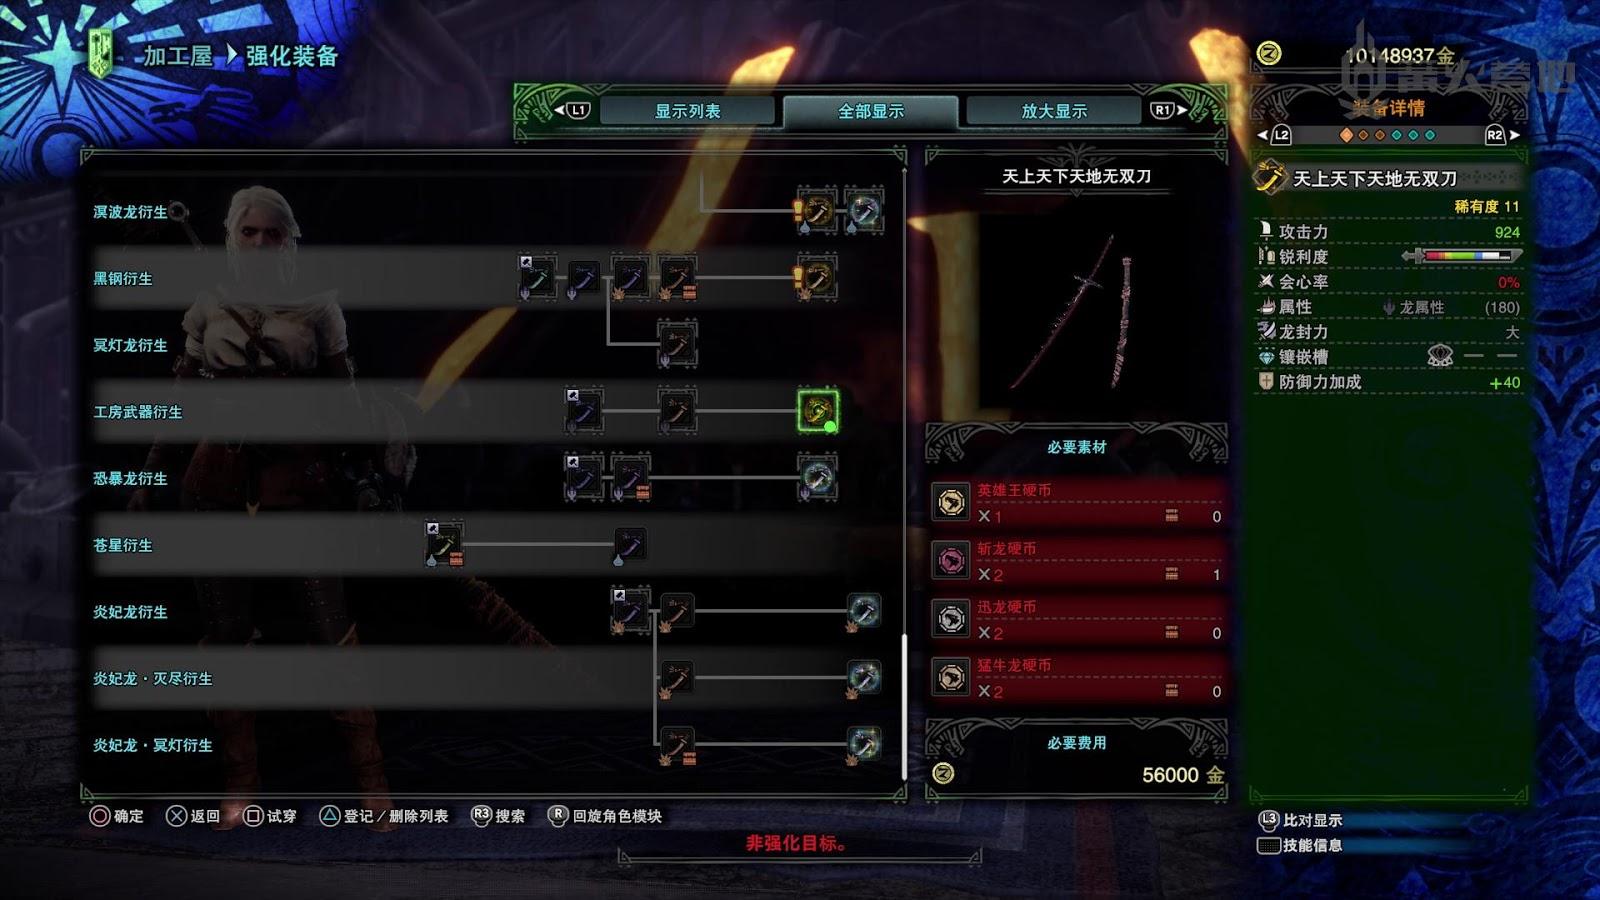 mhw Iceborne 強化天上天下無雙刀指南 - 魔物獵人 世界 Monster Hunter World 遊戲世界